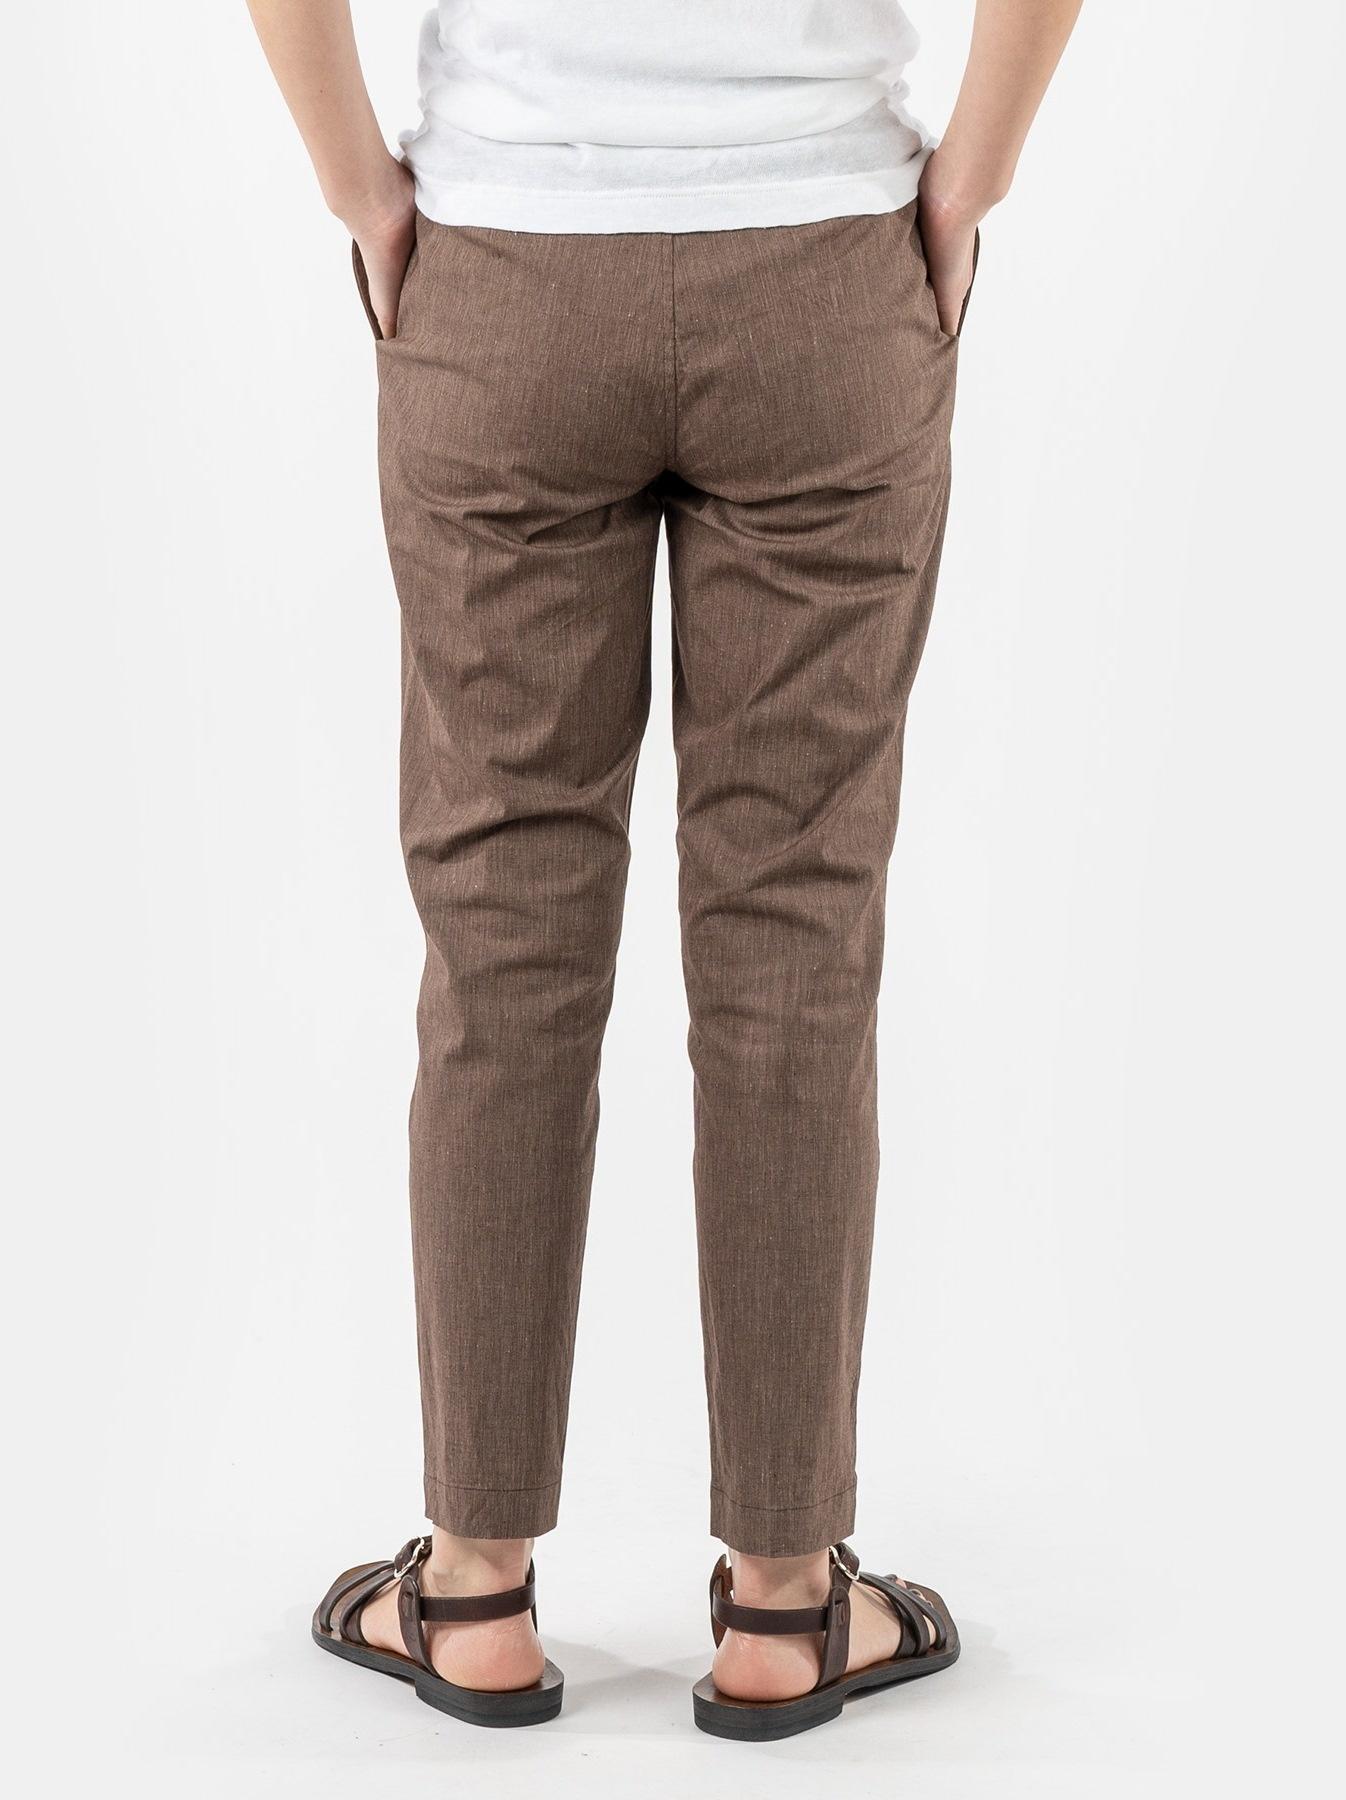 WH Cotton Linen Hakeme Stretch Pants-5